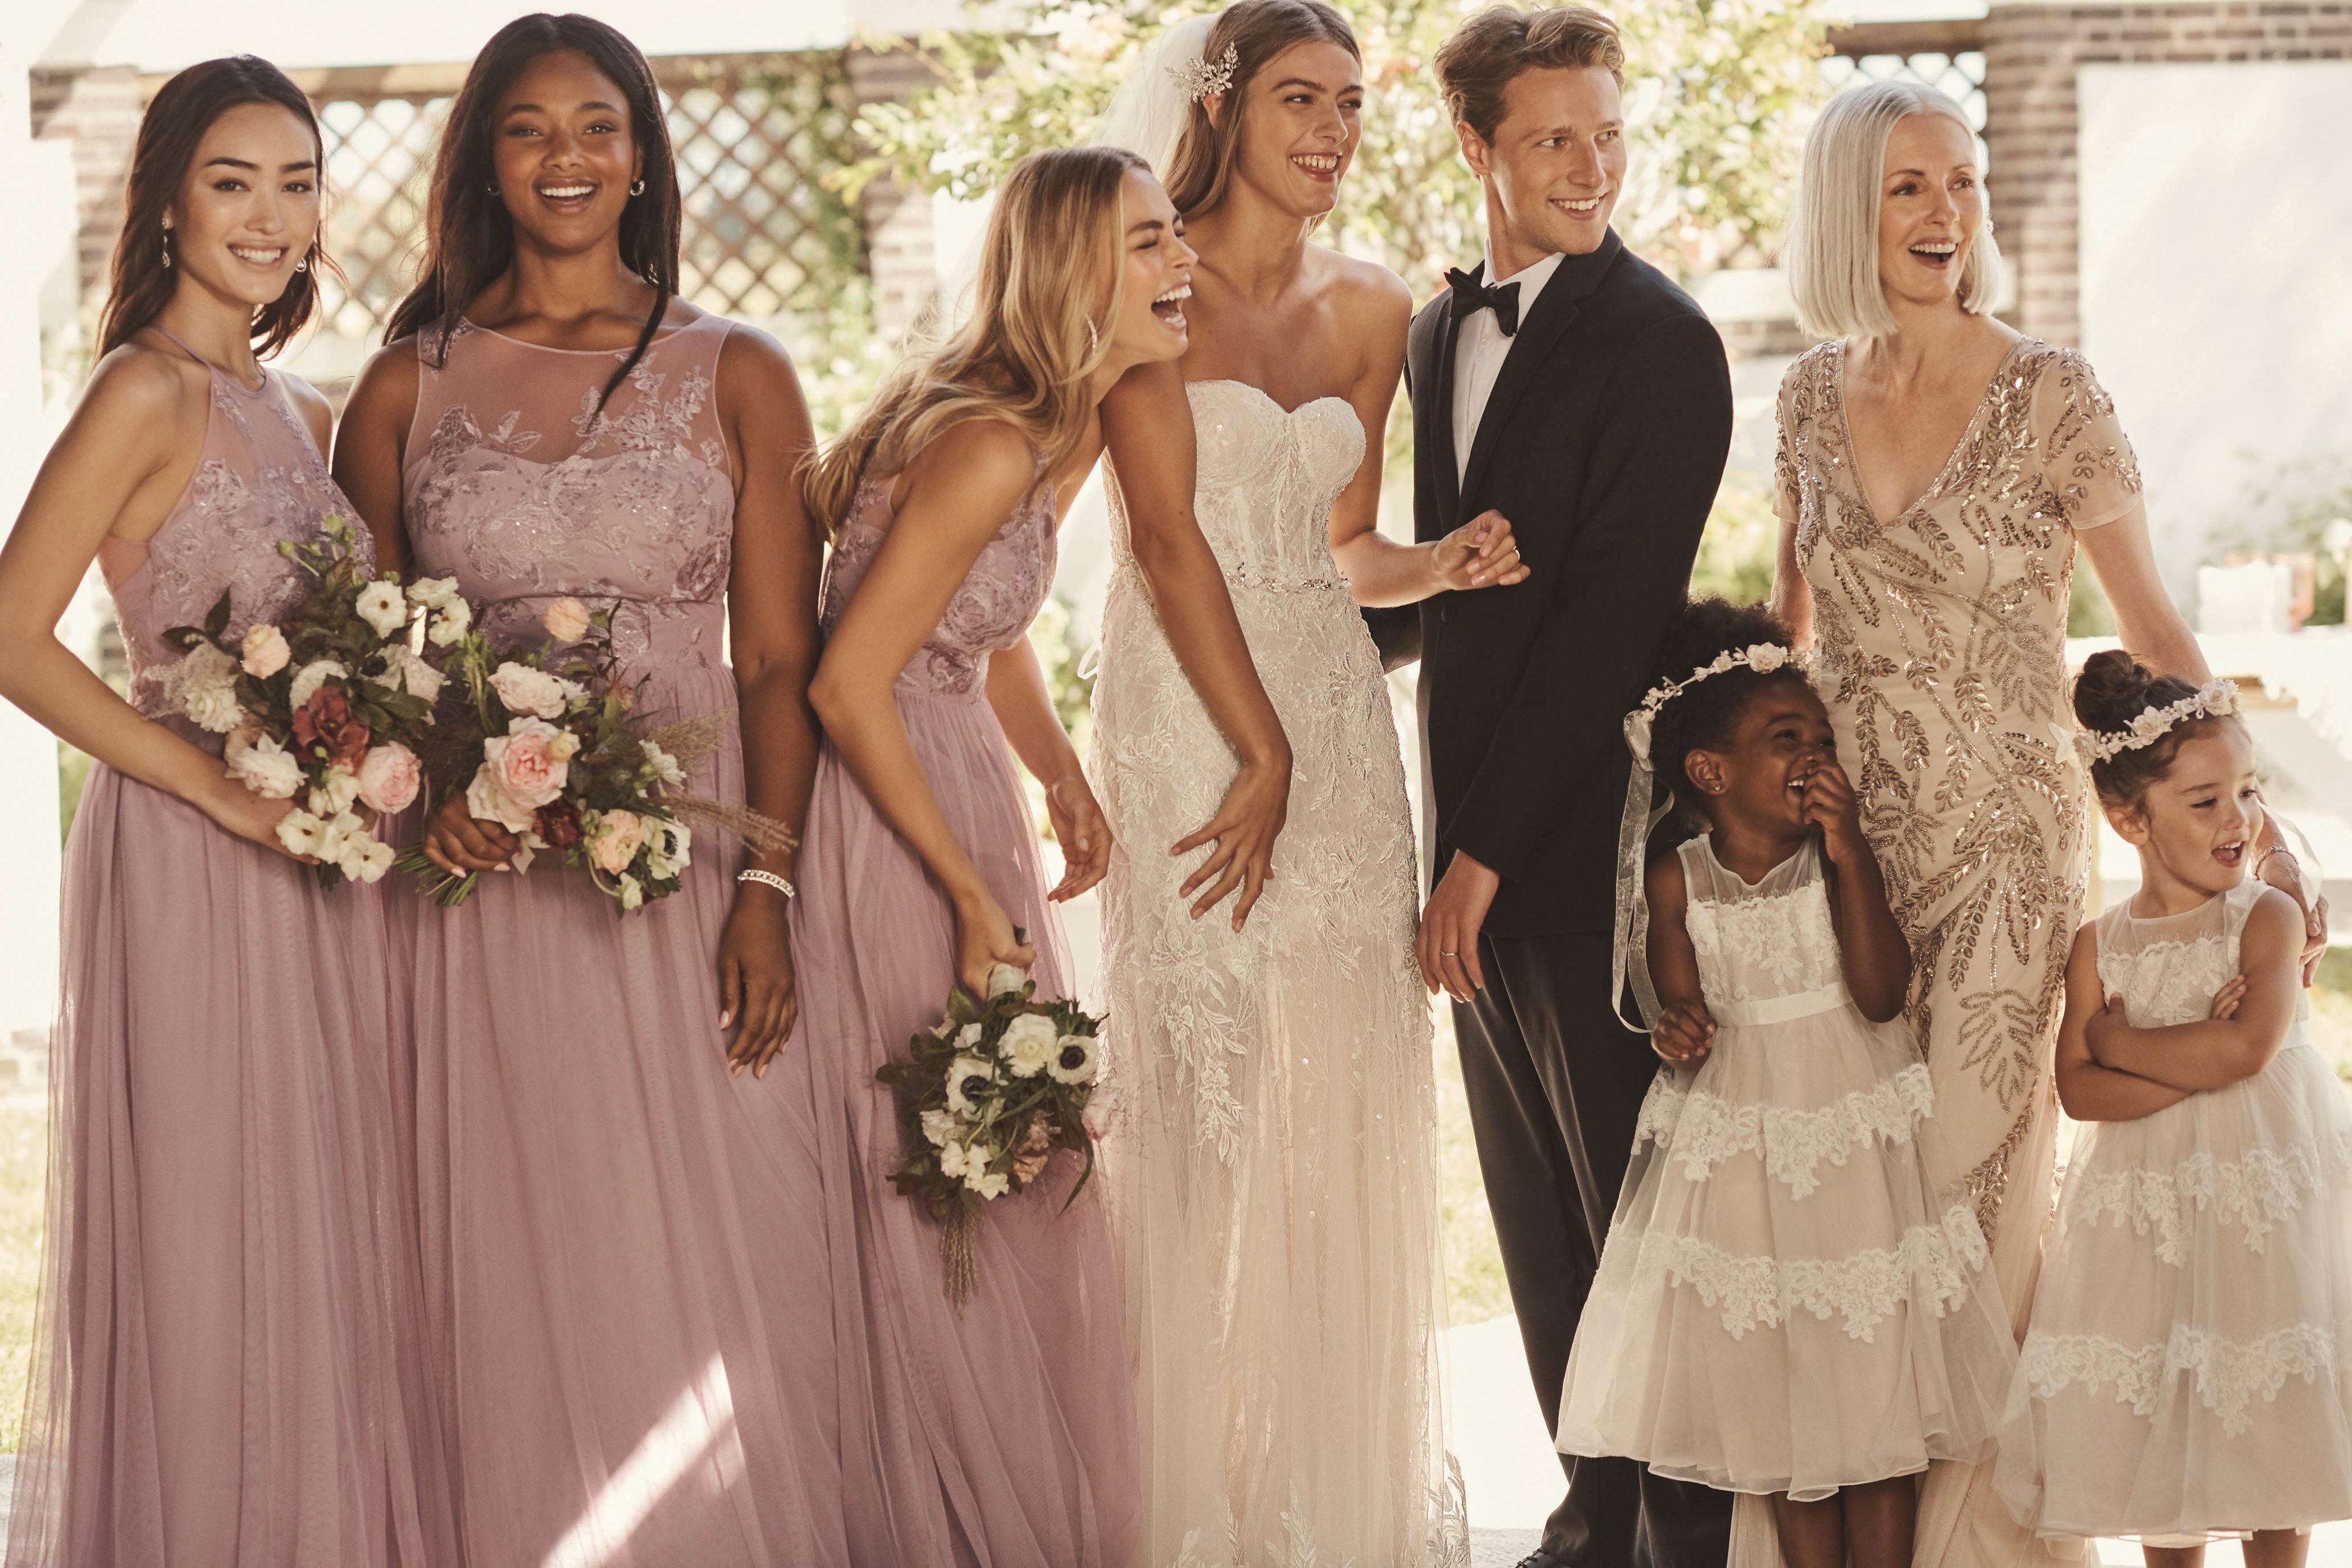 Full bridal party featuring lavender haze bridesmaid dresses